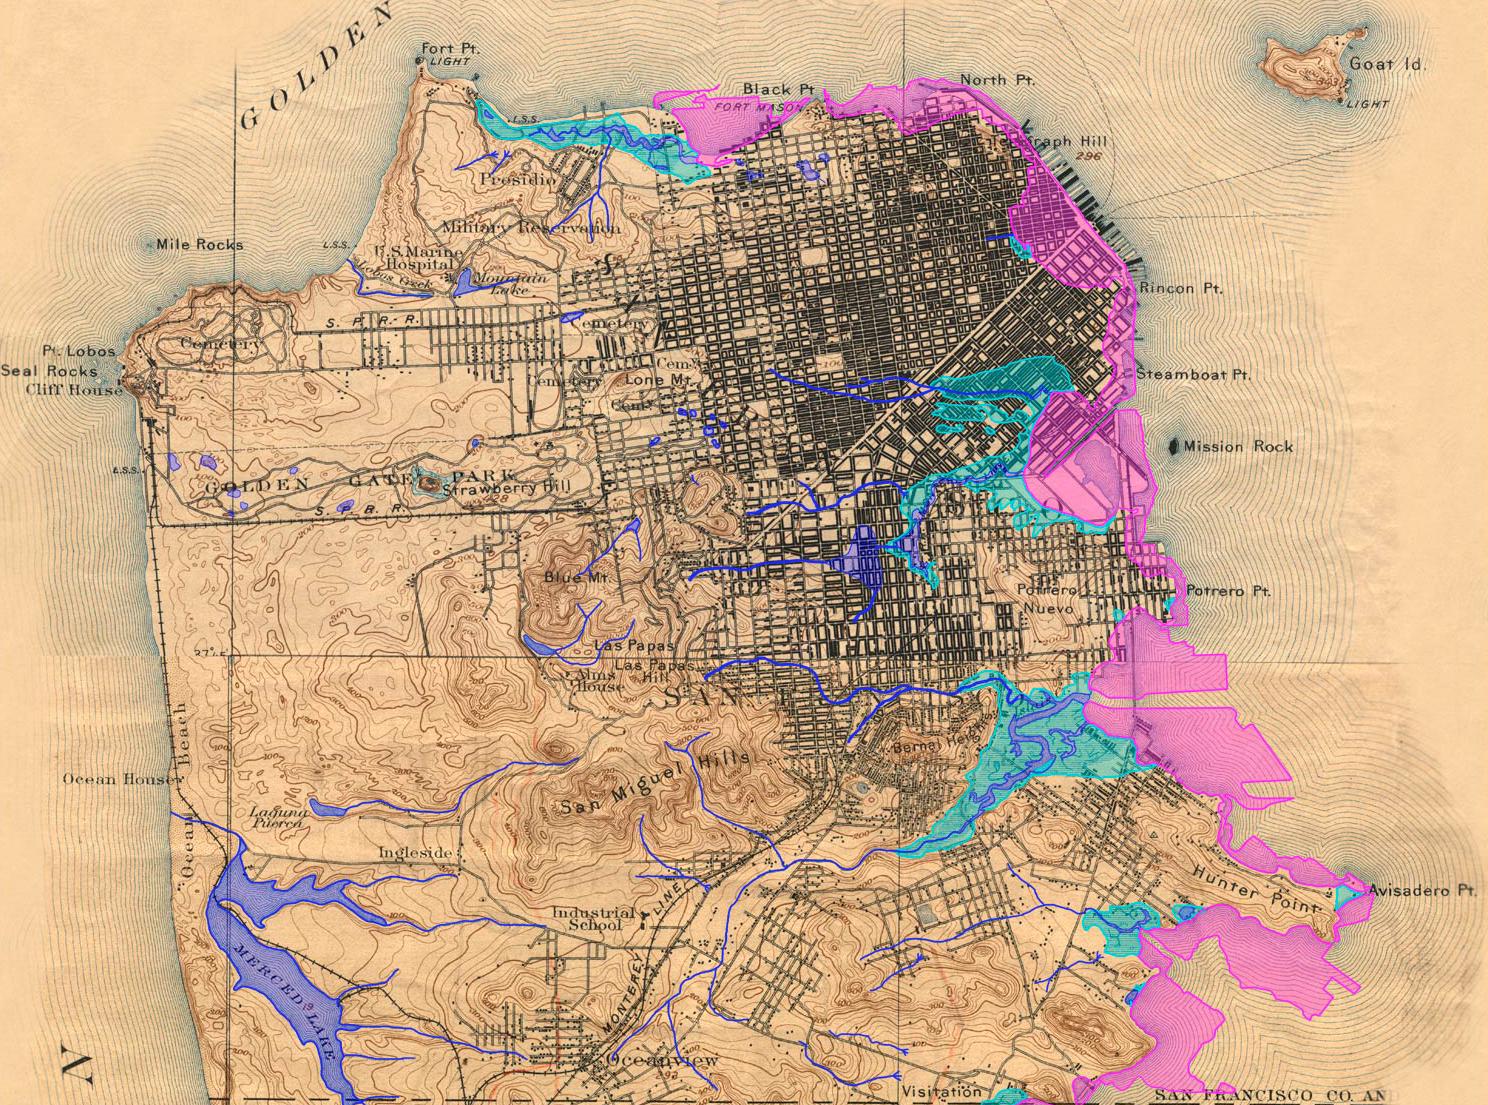 shoreline contour guide or topographic map